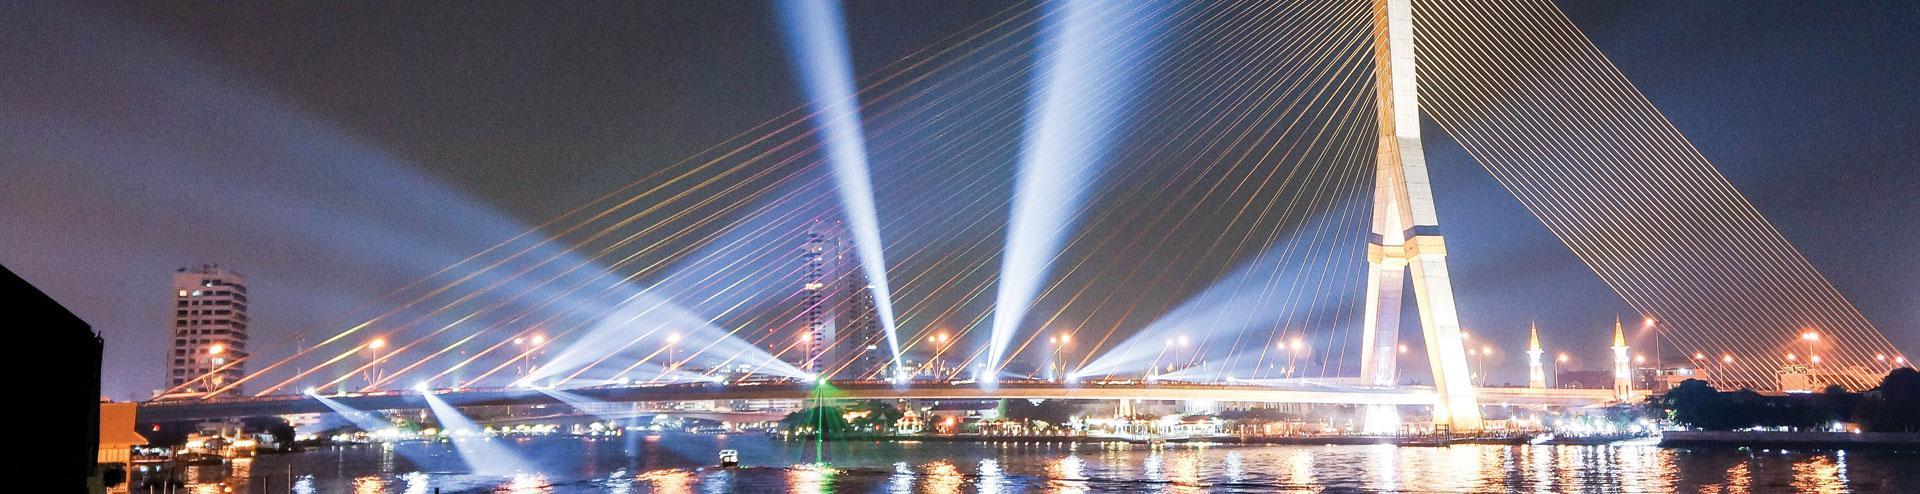 Architectural-lighting-Rama-Bridge